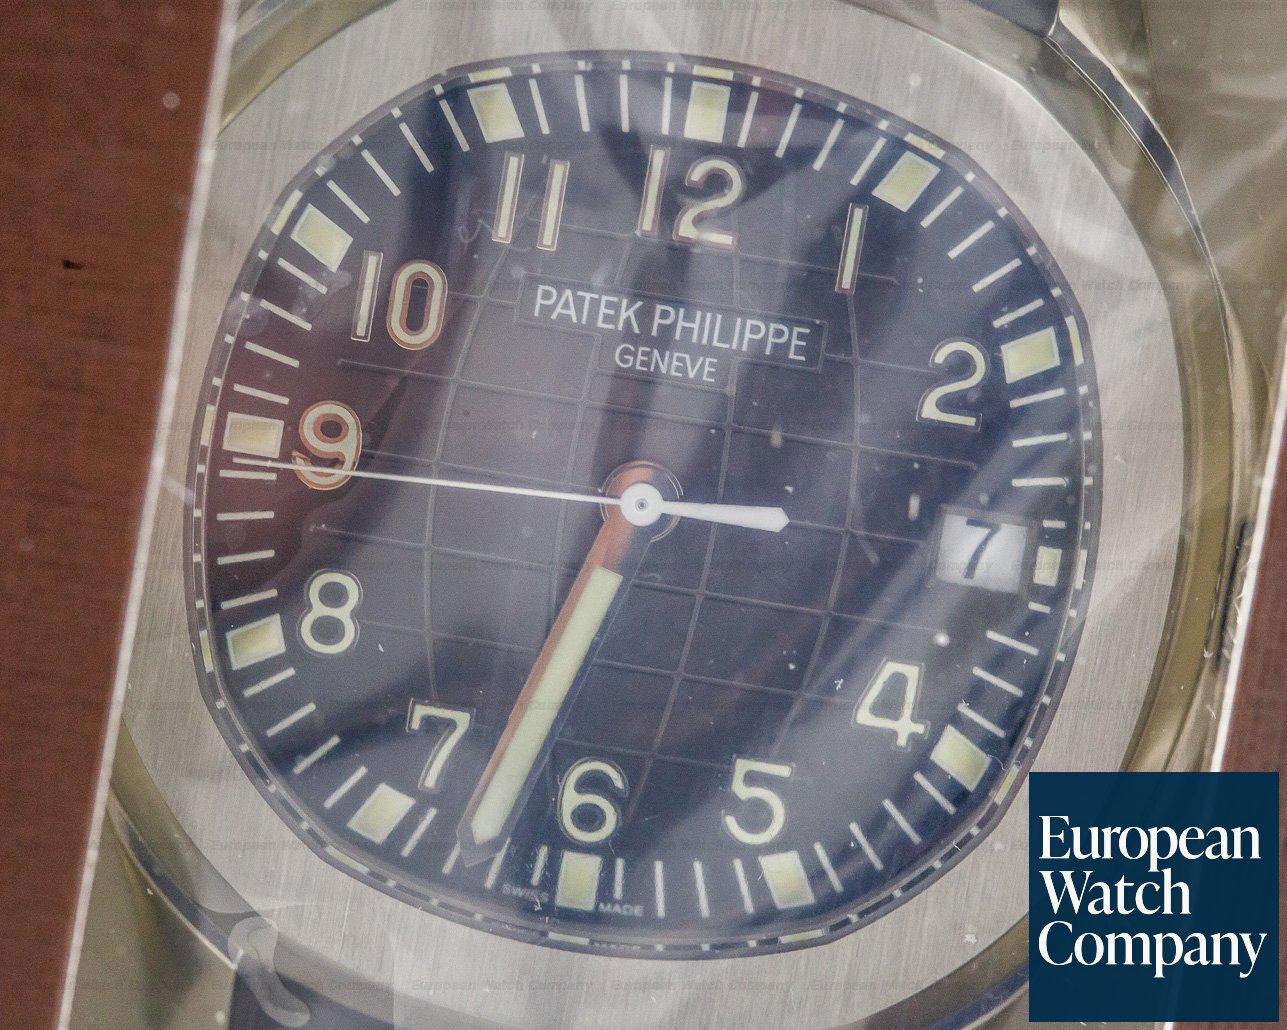 Patek Philippe 5167A-001 Aquanaut SS / Rubber DOUBLE SEALED